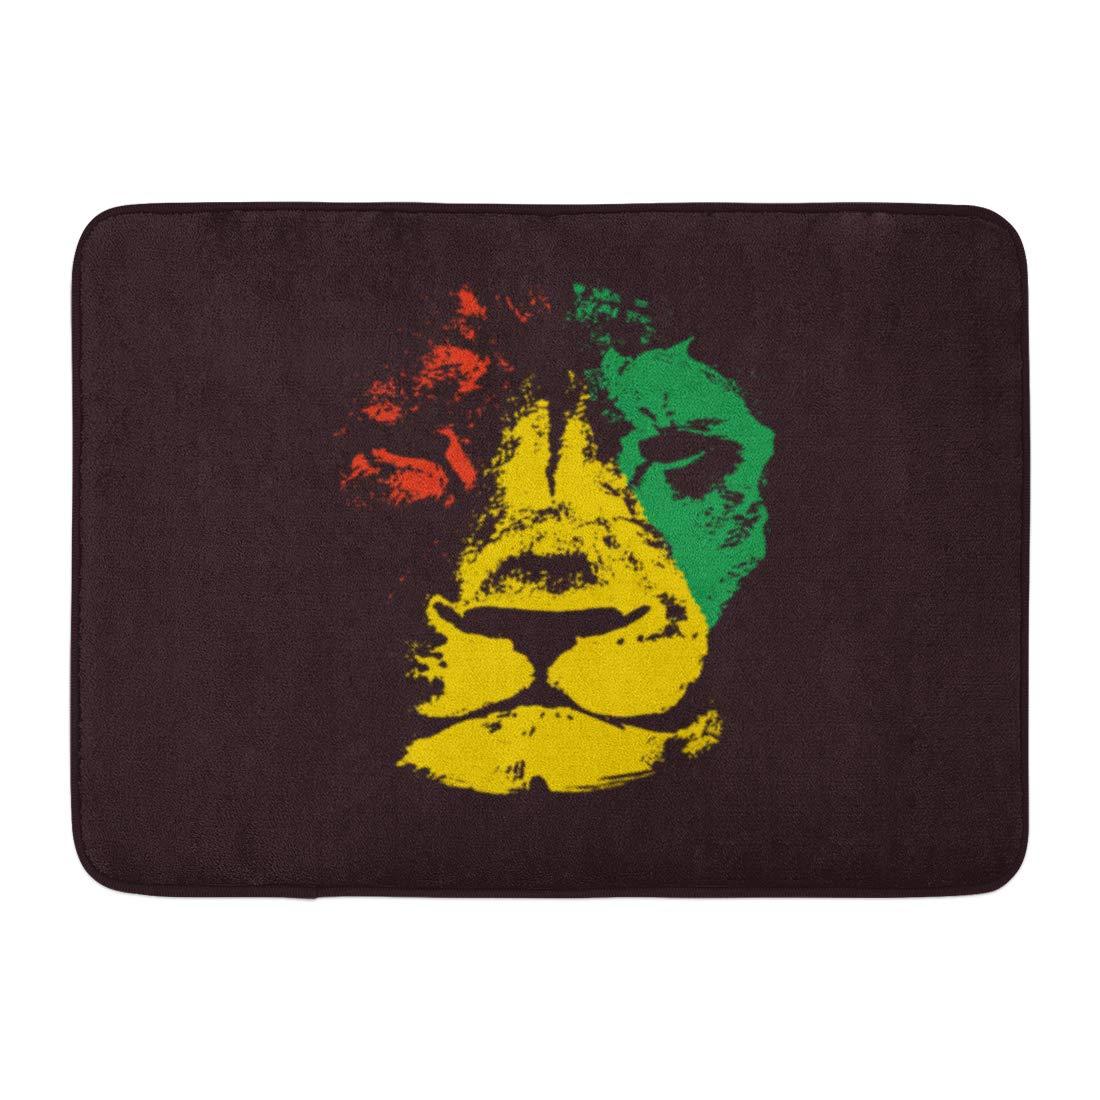 "Colorful Decor Lion Head Bath Mat Bathroom Rug Non-Slip Home Decor Carpet 24x16/"""